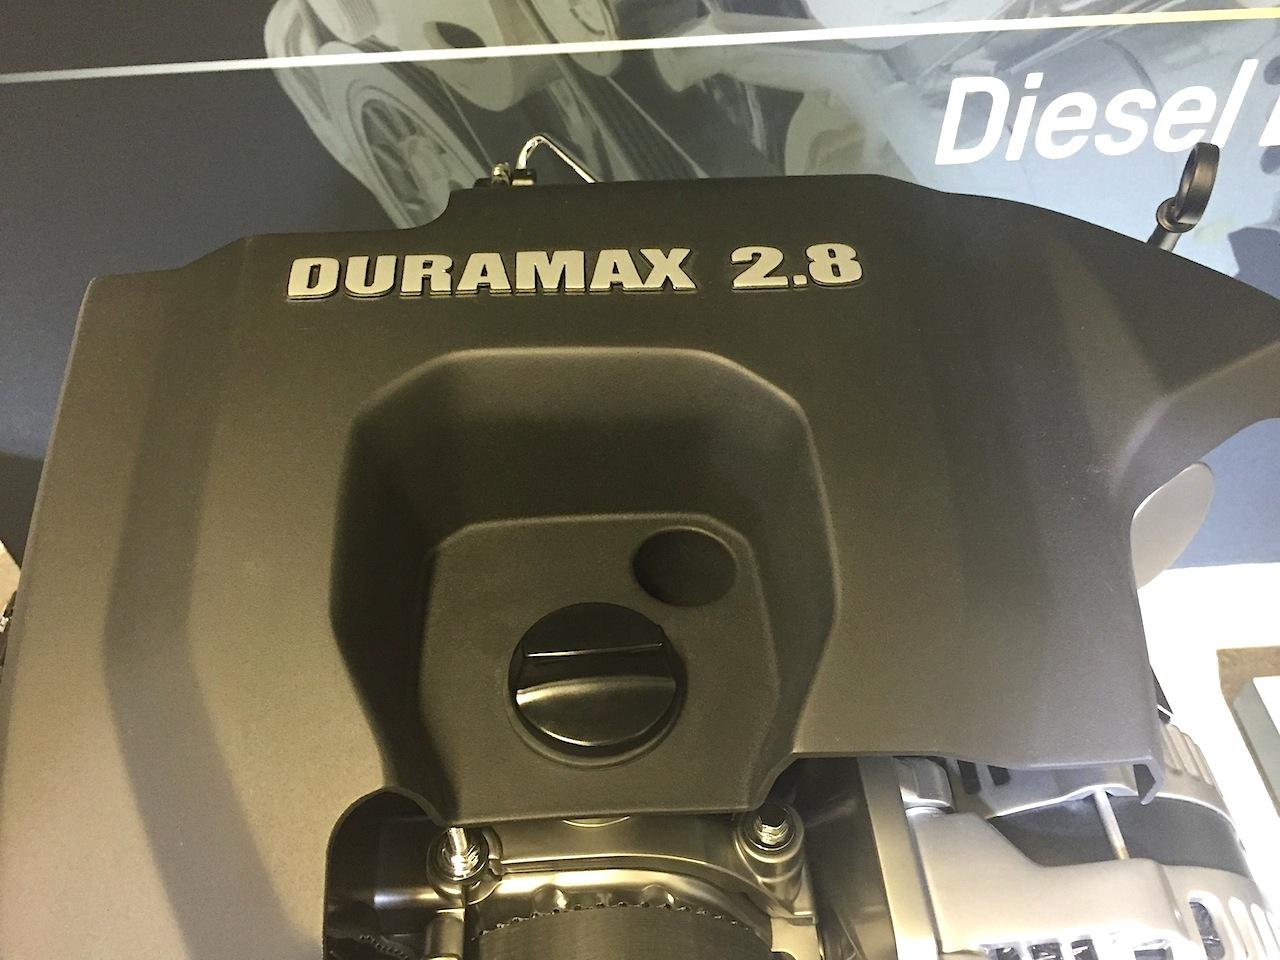 hight resolution of 2016 chevy colorado turbo diesel engine internals duramax